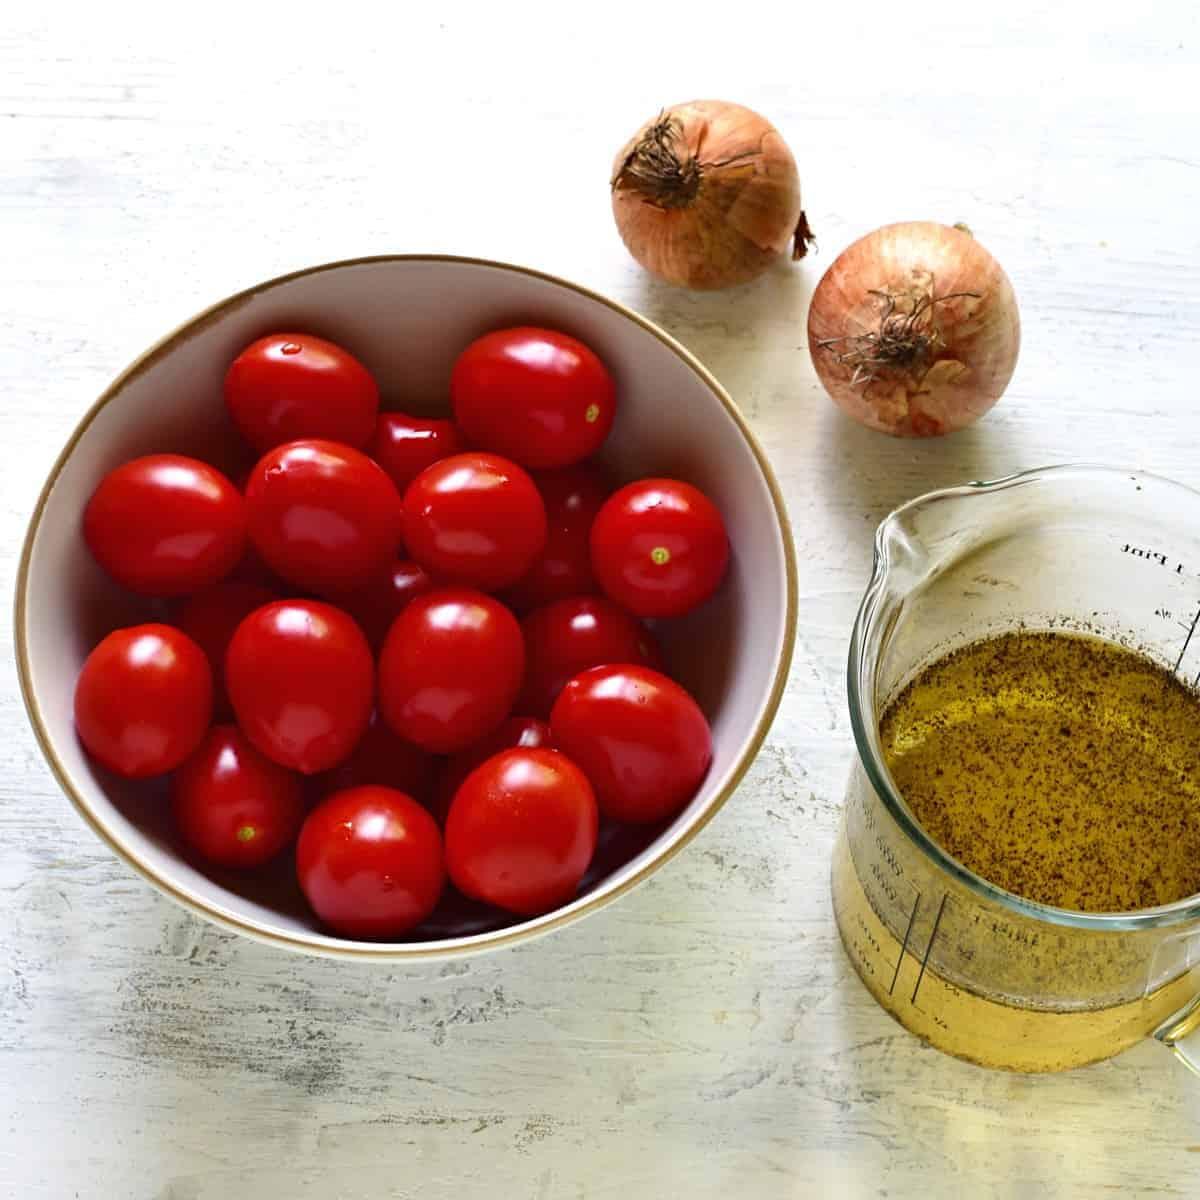 Czech tomato salad ingredients